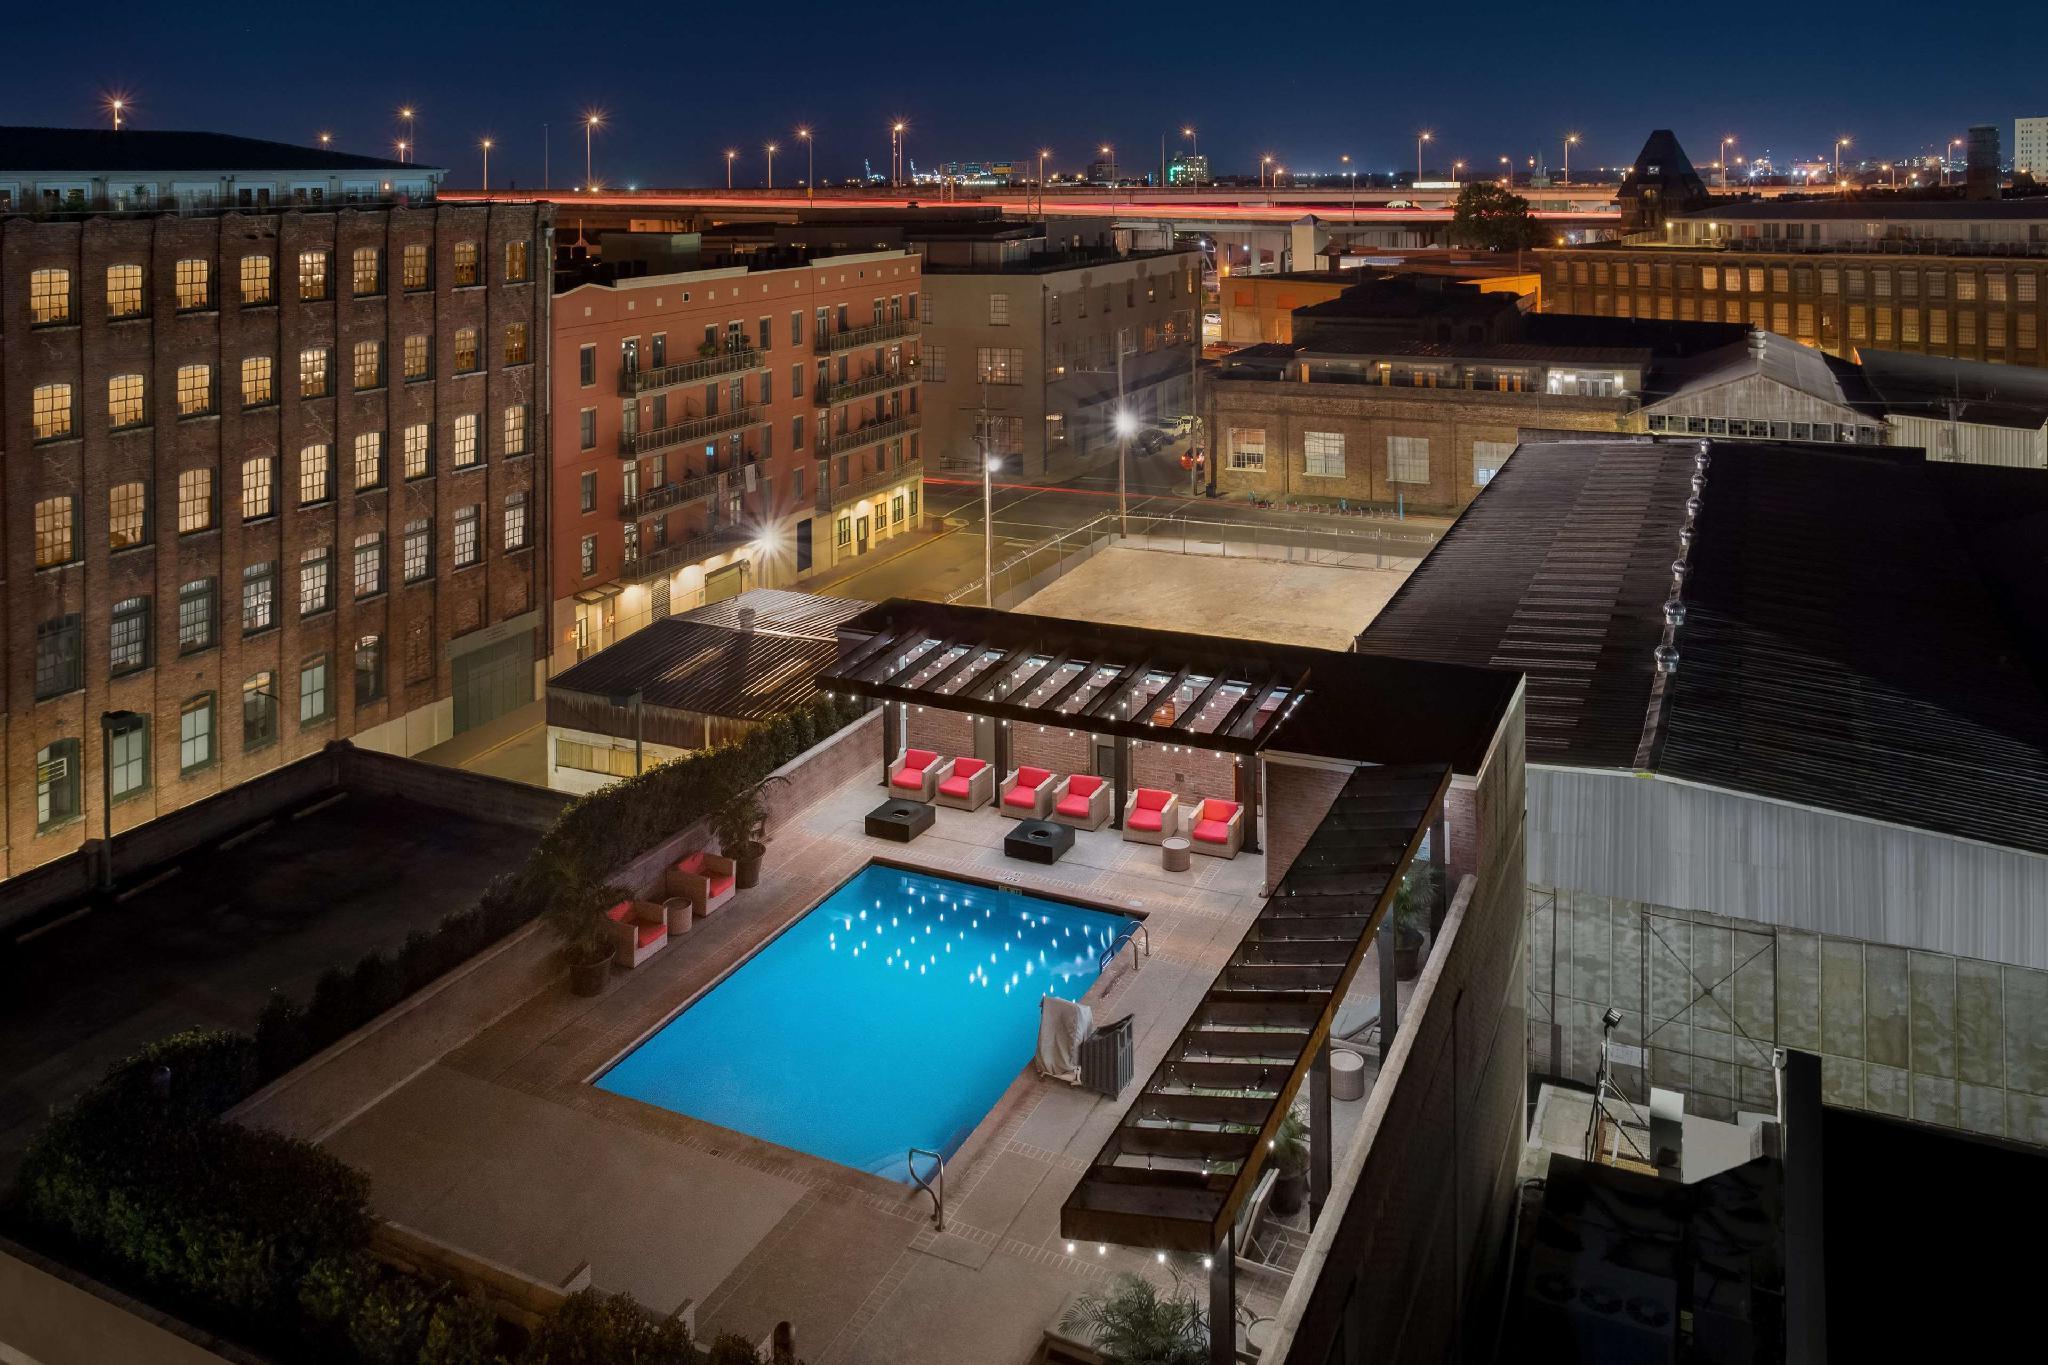 Hilton Garden Inn New Orleans Convention Center Hotel